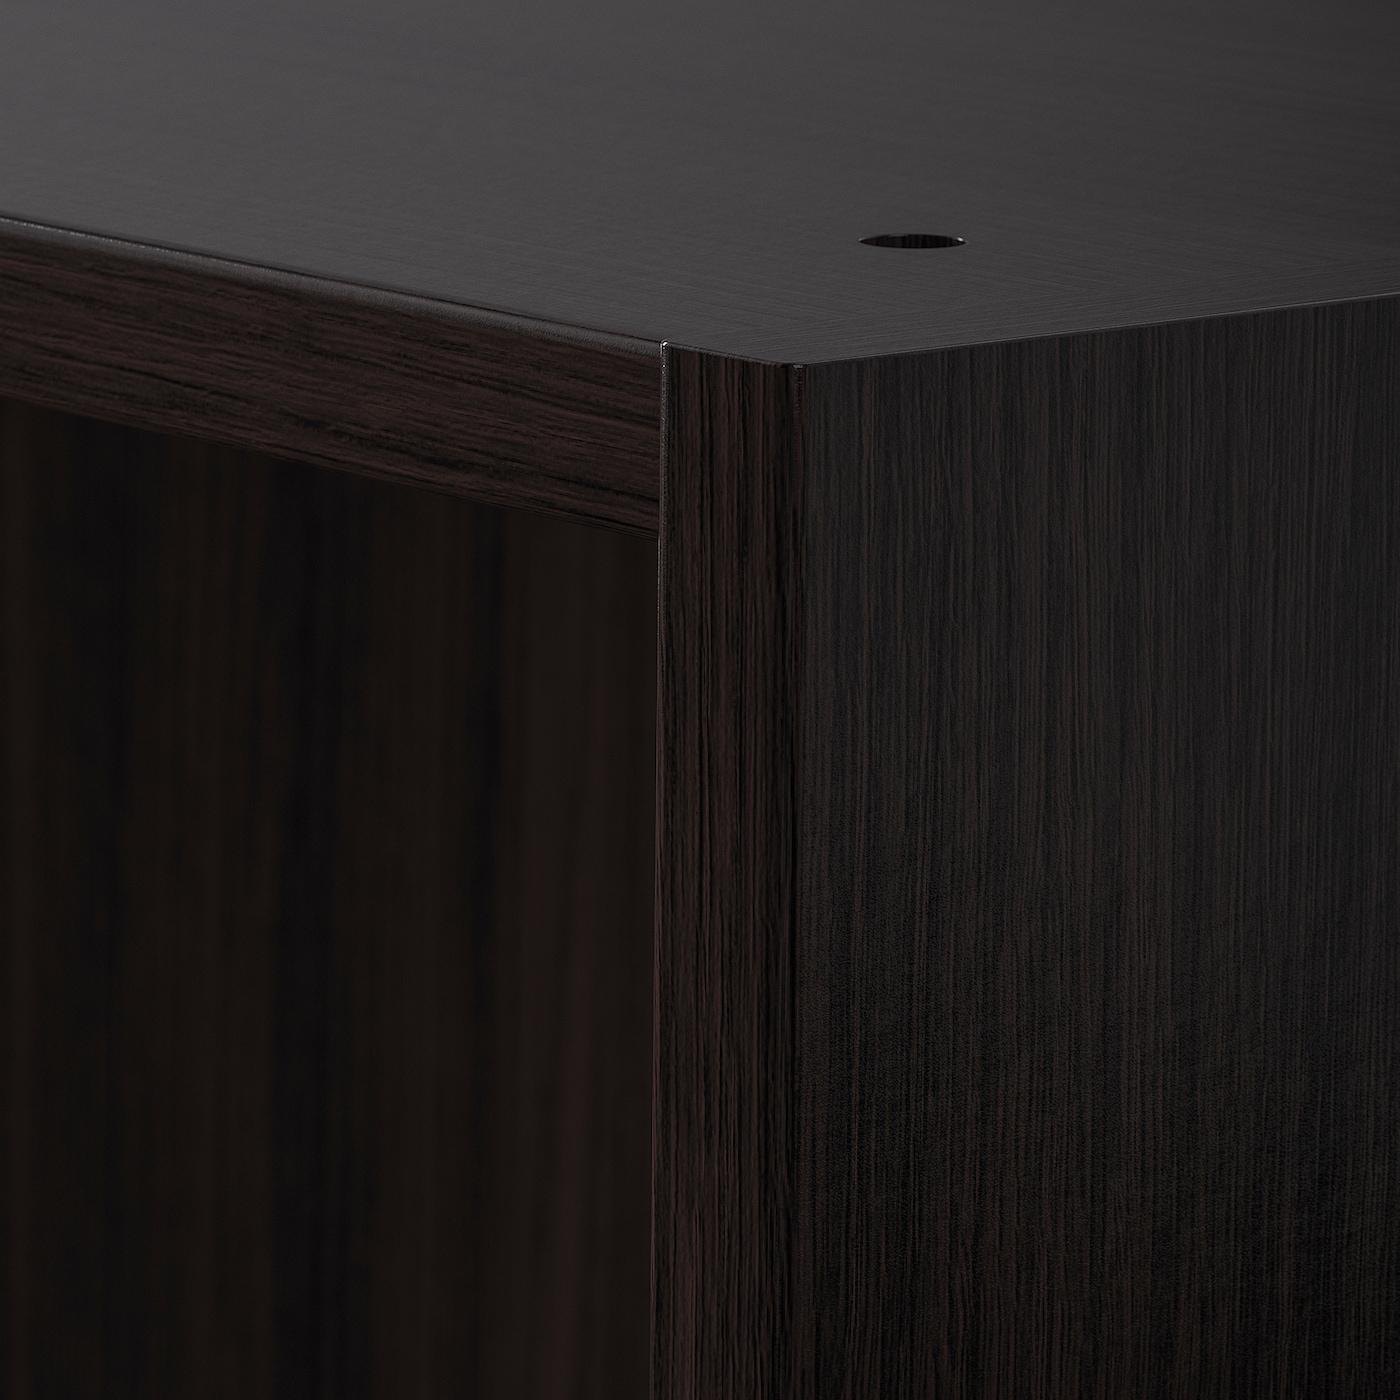 PAX Wardrobe frame, black-brown, 75x58x201 cm